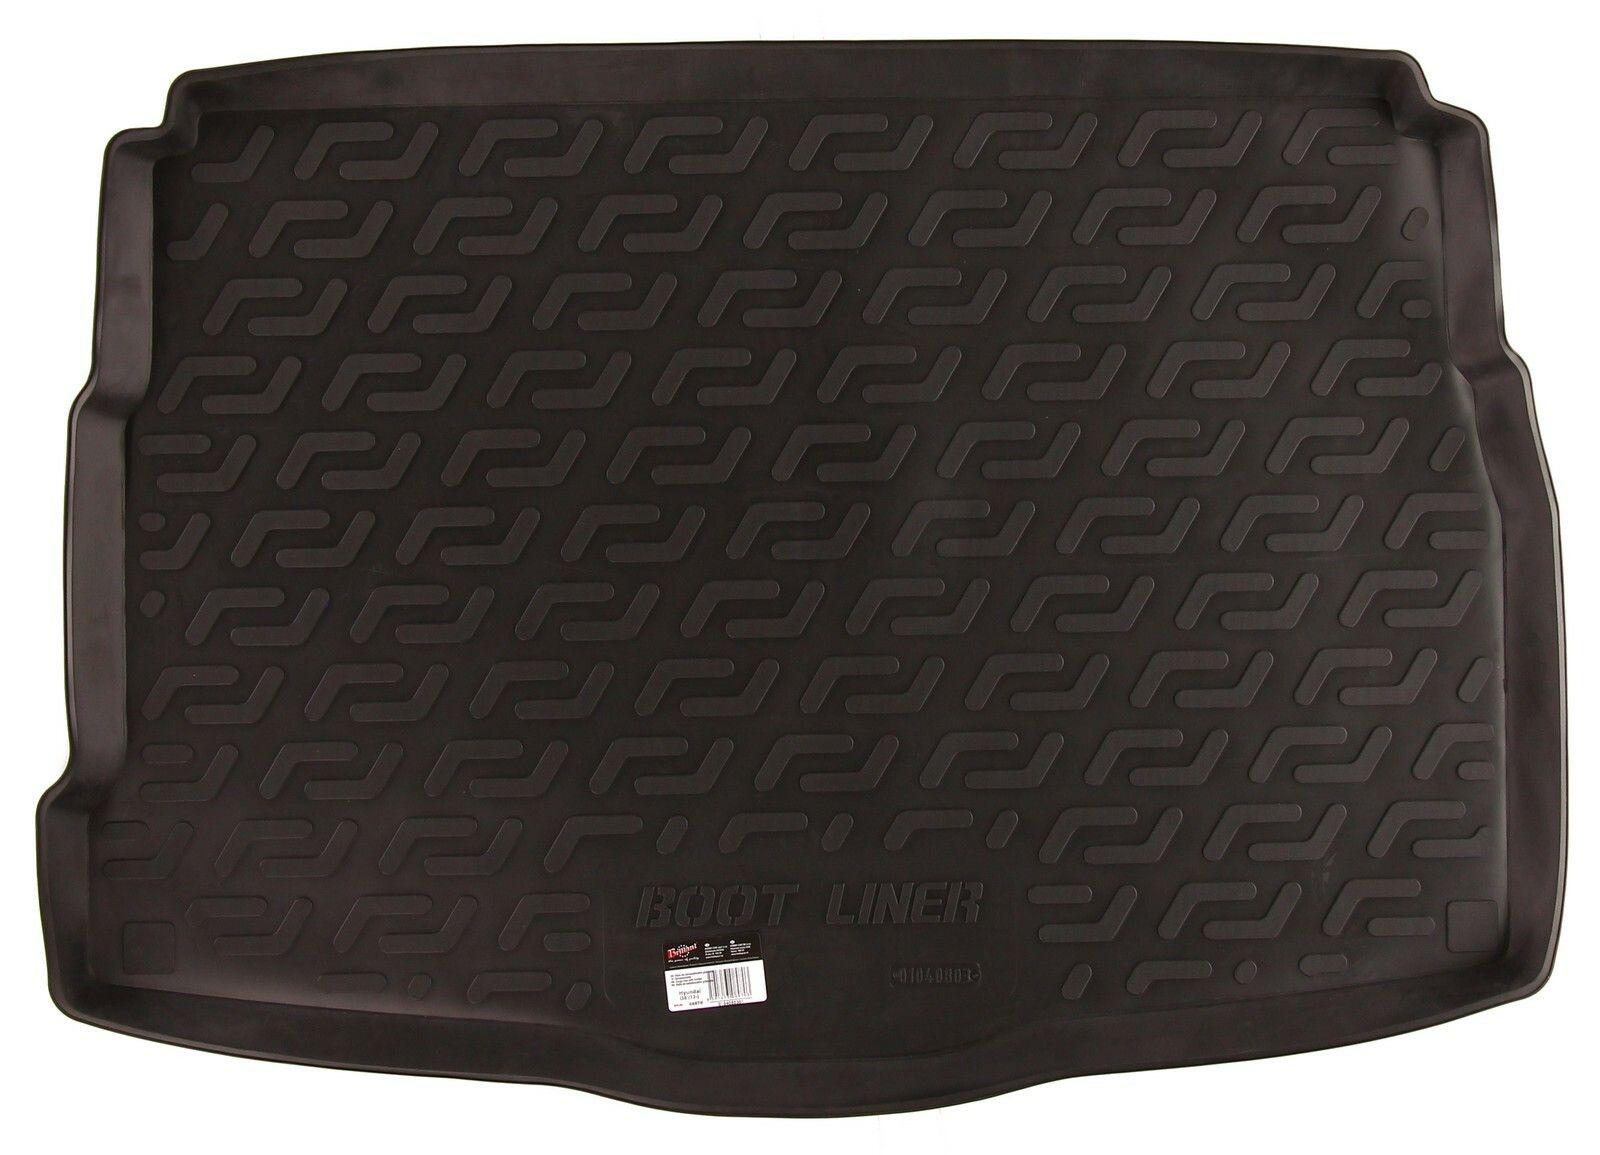 Vana do kufru gumová Hyundai i30 II (GD) (12-)